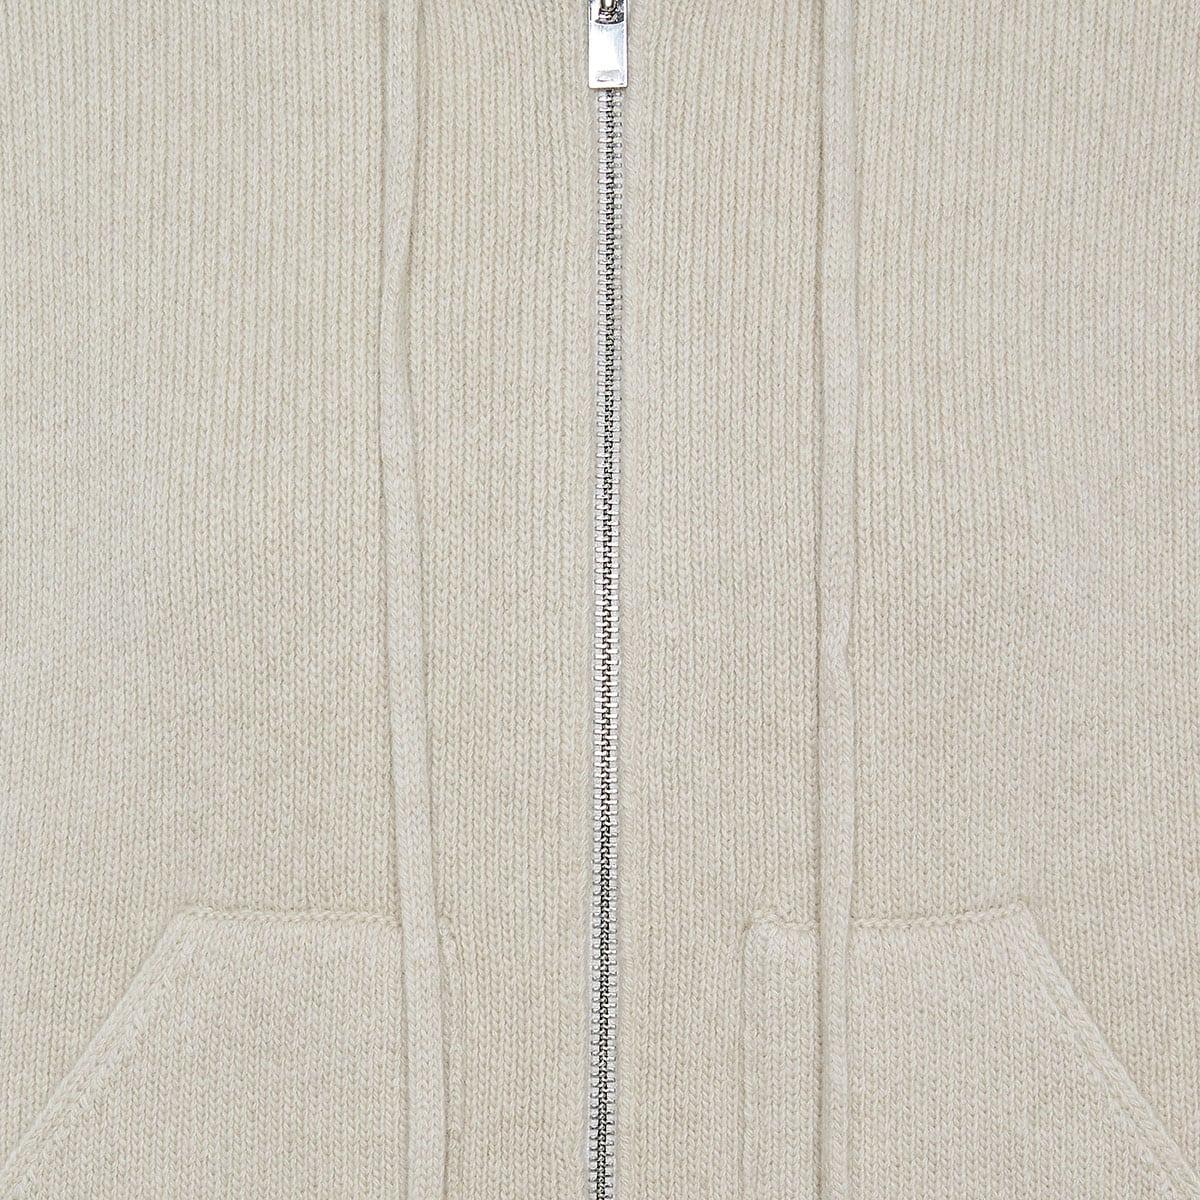 Oversized knitted zip hoodie